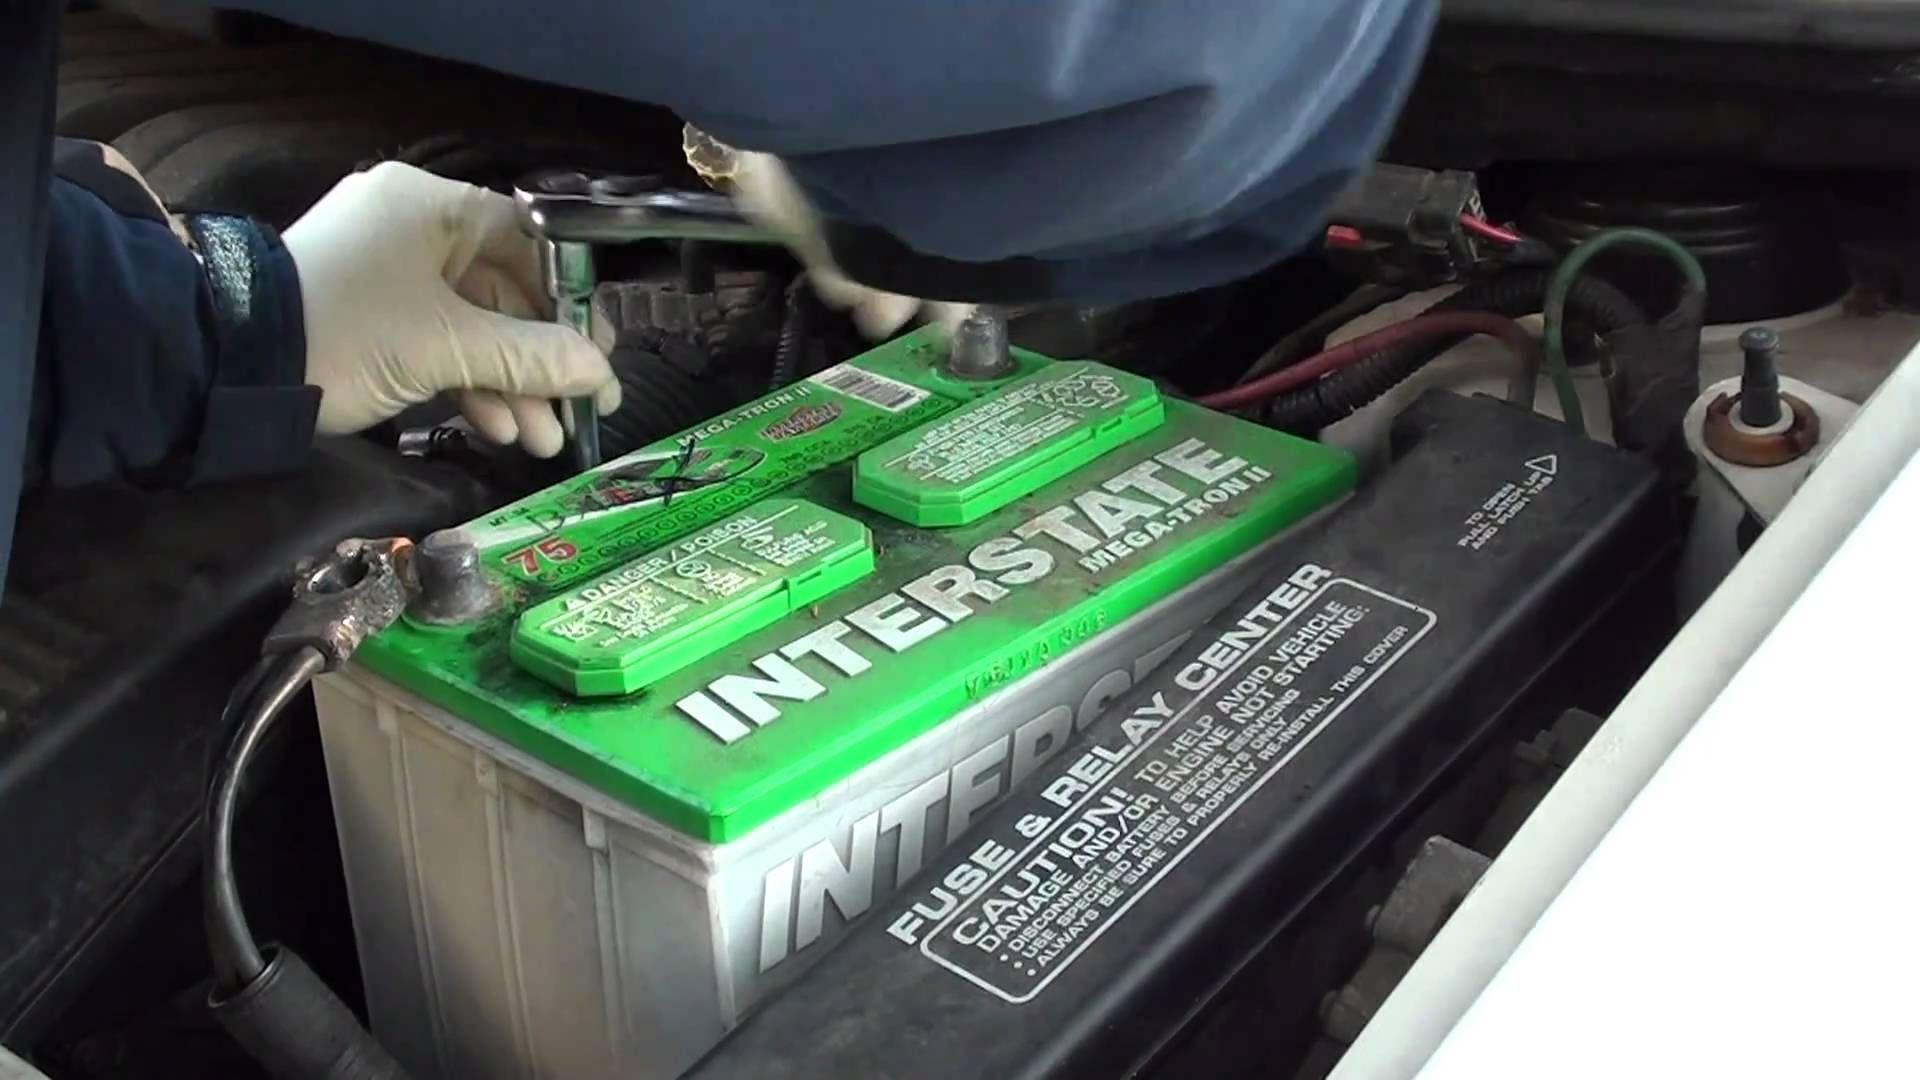 How to Replace a Car Battery Car battery, Car, Repair